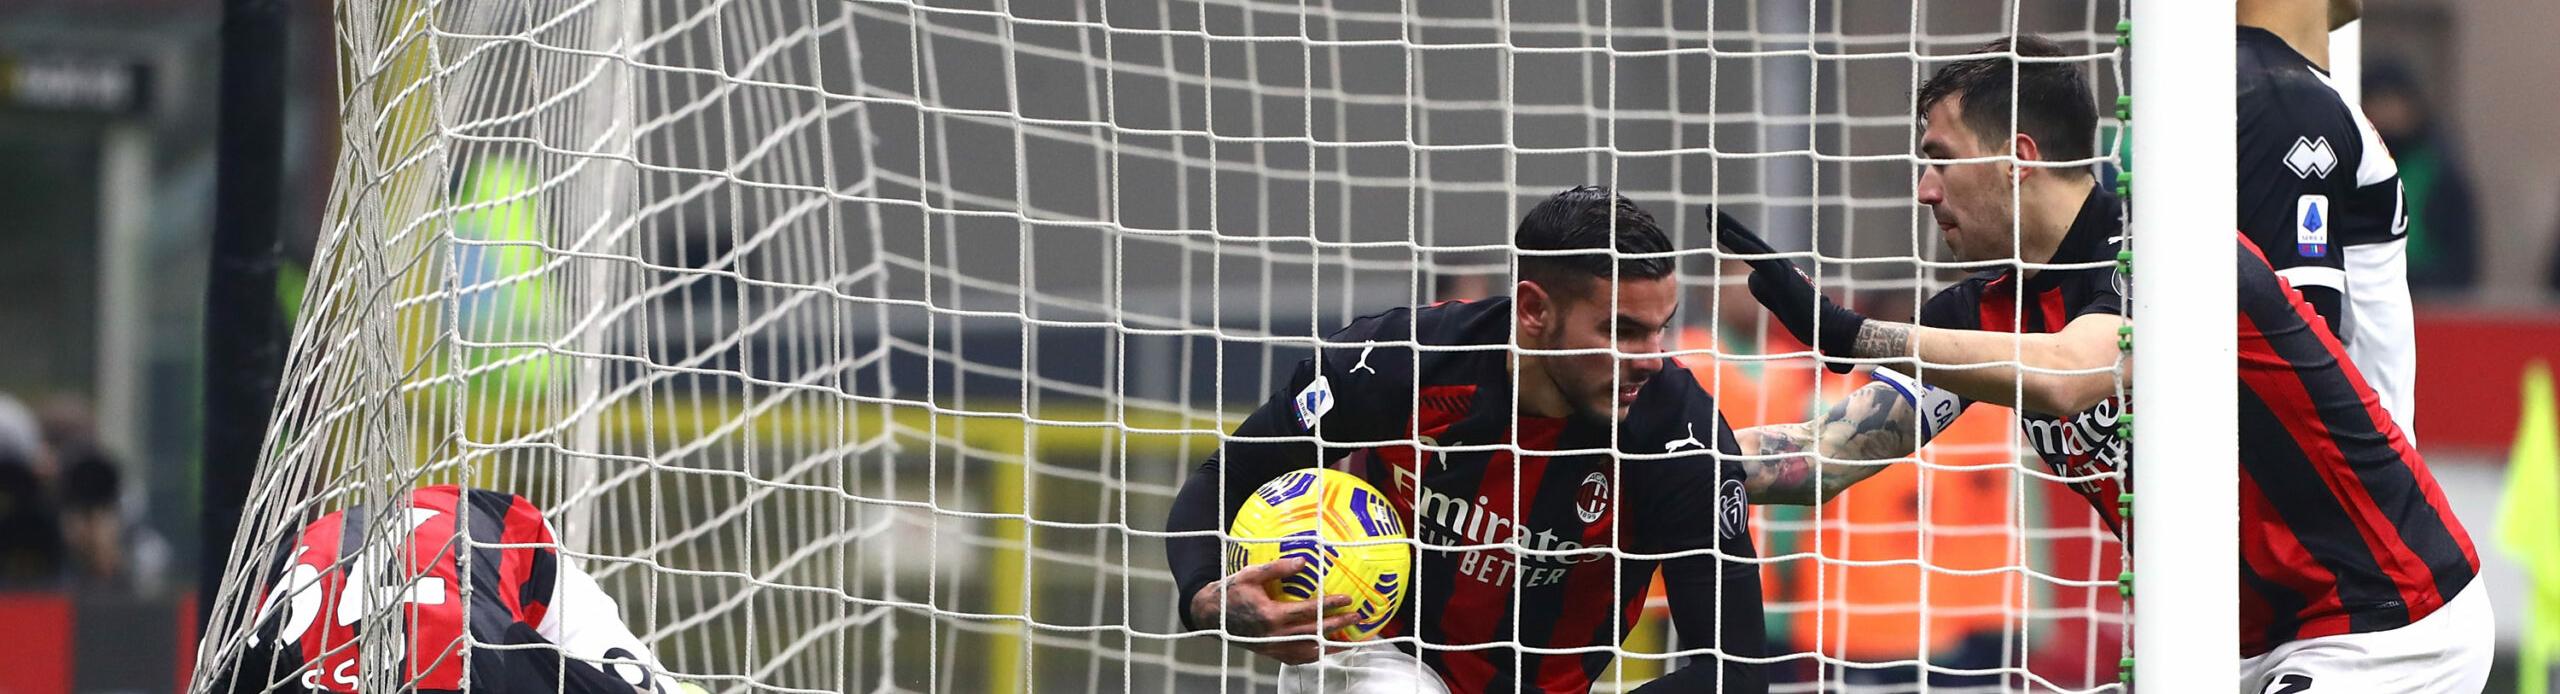 Parma-Milan: D'Aversa cerca punti salvezza, Pioli per l'Europa